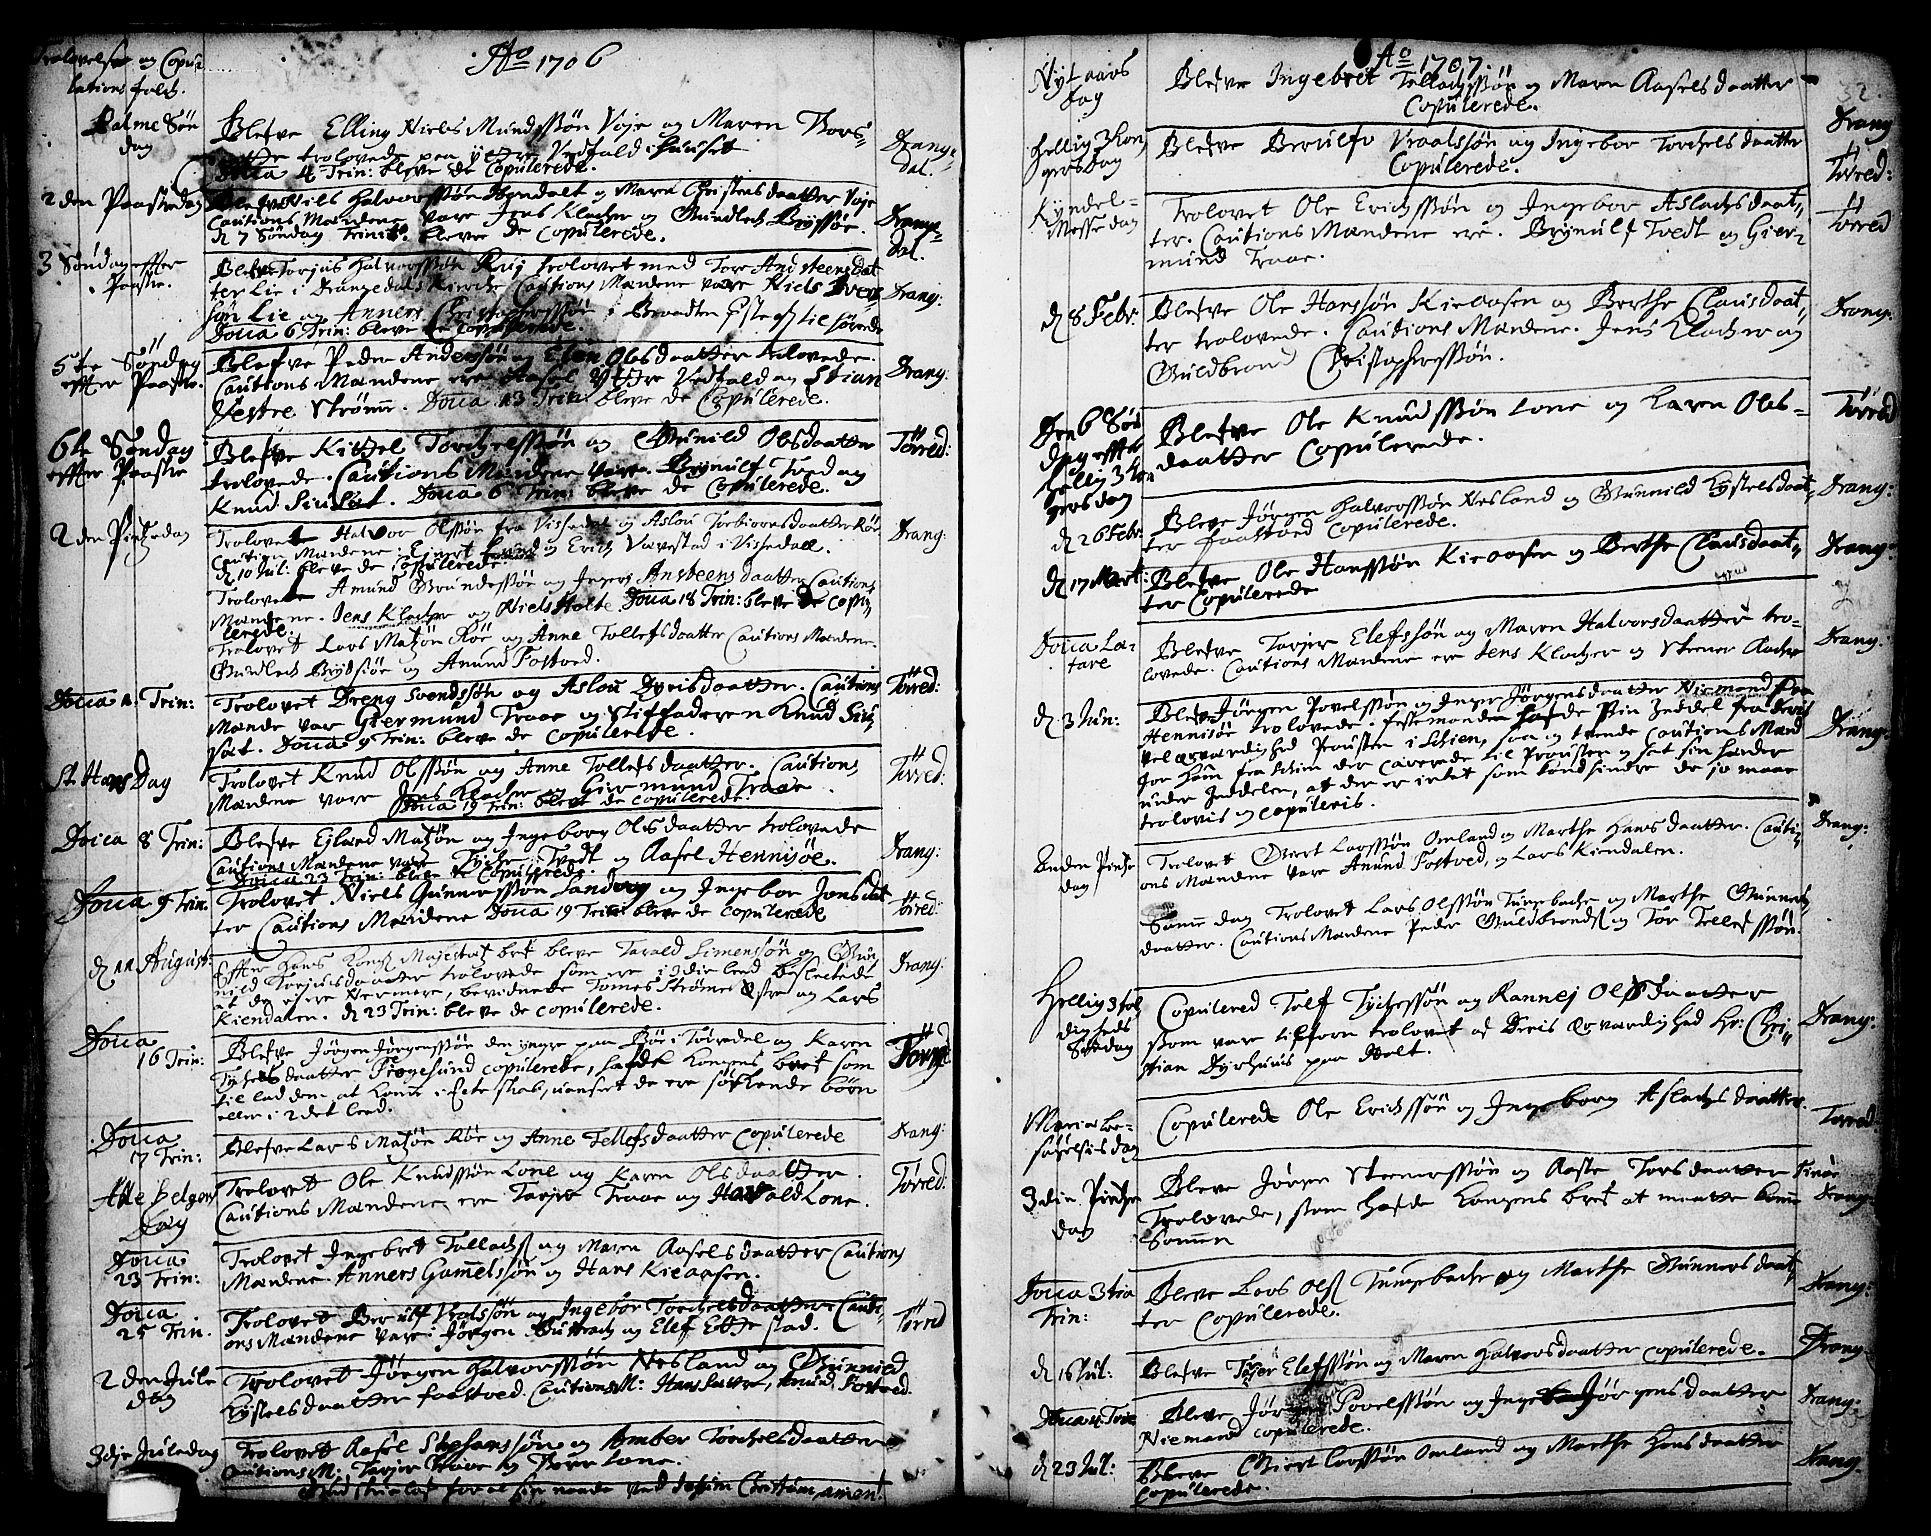 SAKO, Drangedal kirkebøker, F/Fa/L0001: Ministerialbok nr. 1, 1697-1767, s. 32